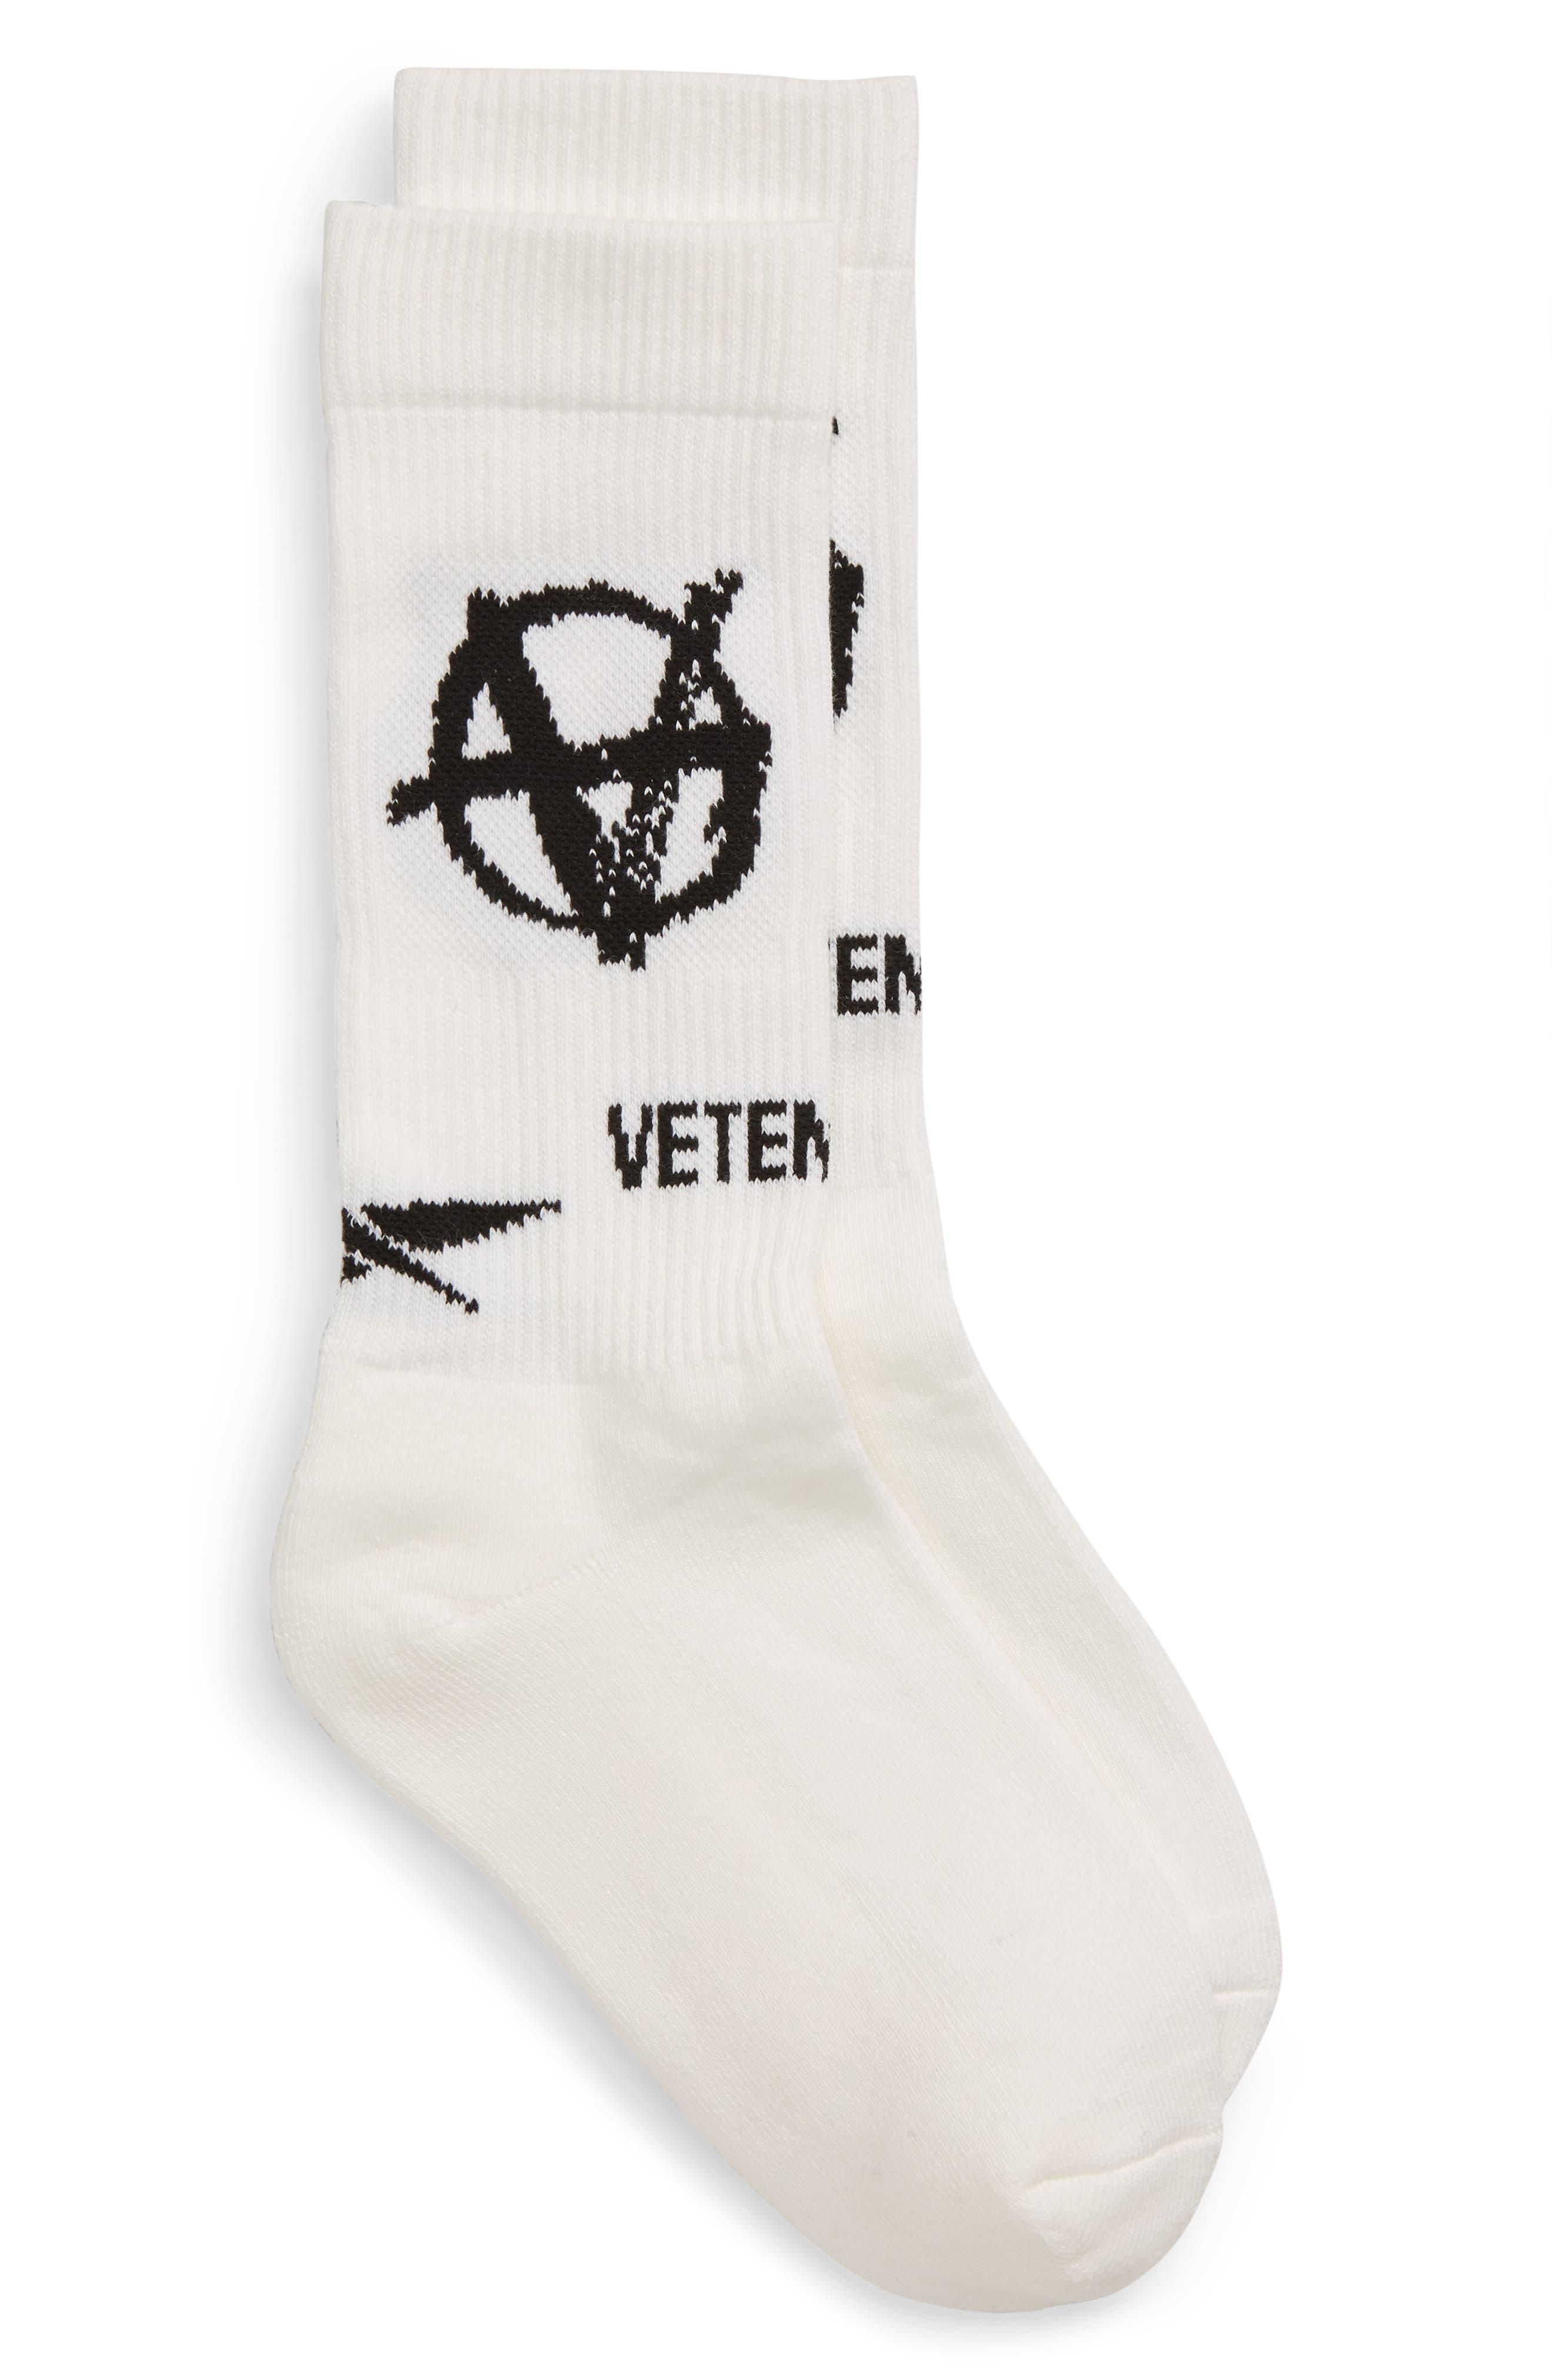 Vetements Socks Anarchy Crew Socks